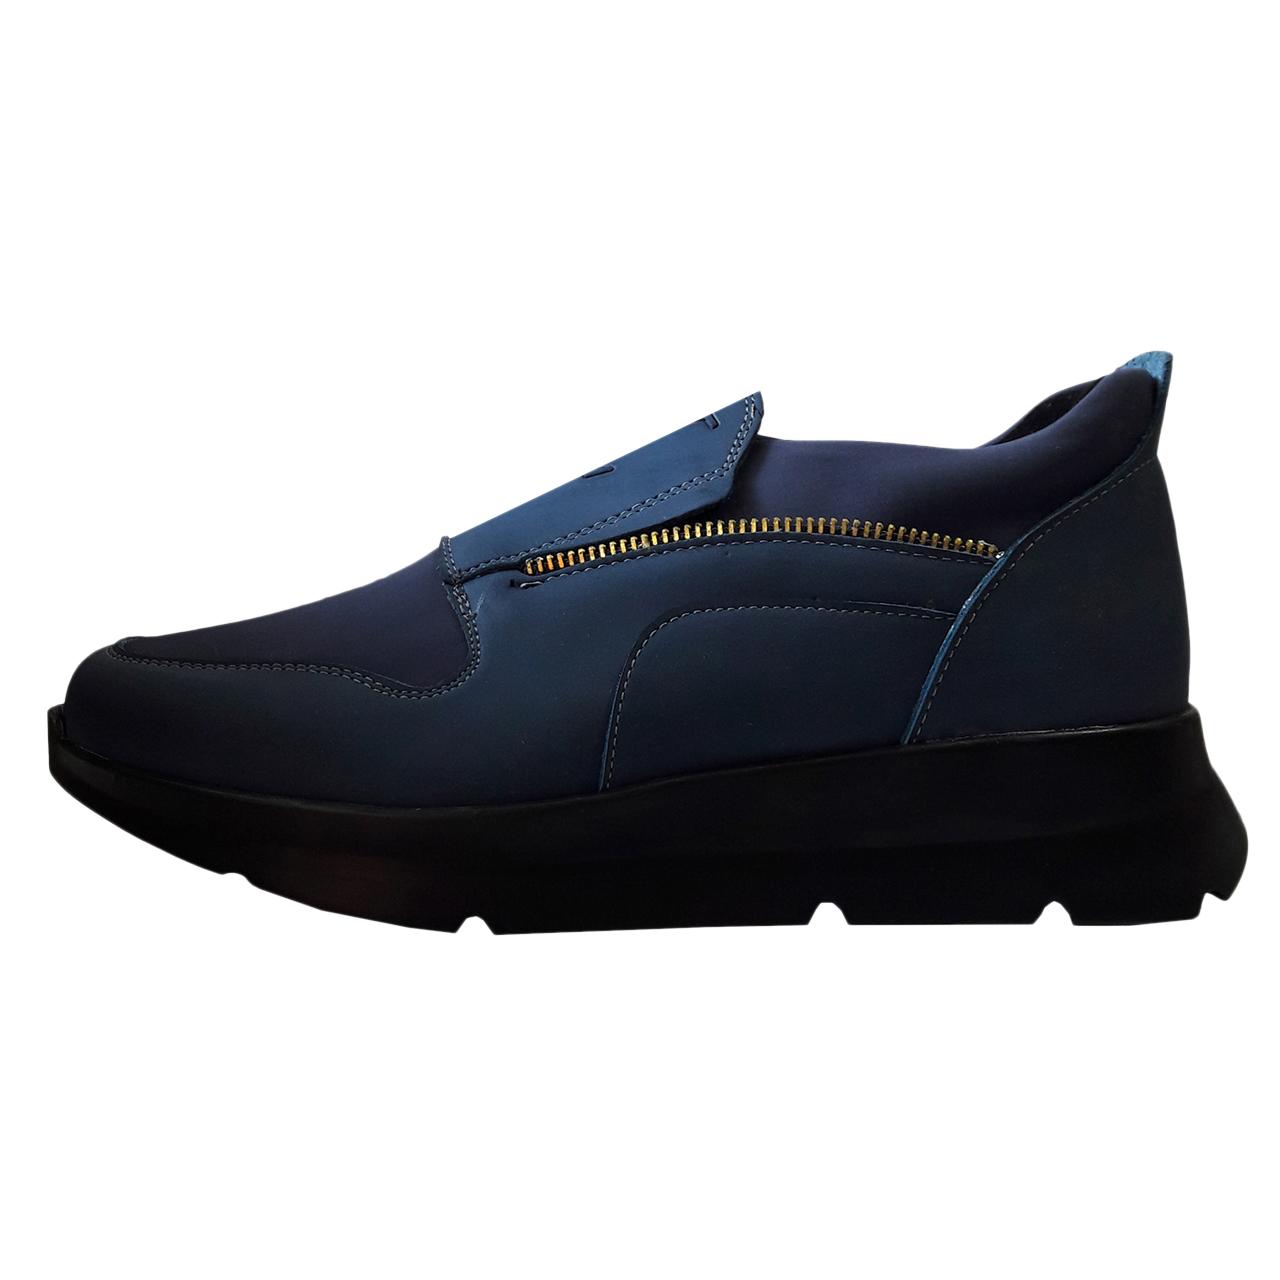 قیمت کفش راحتی مردانه مدل L nvy01